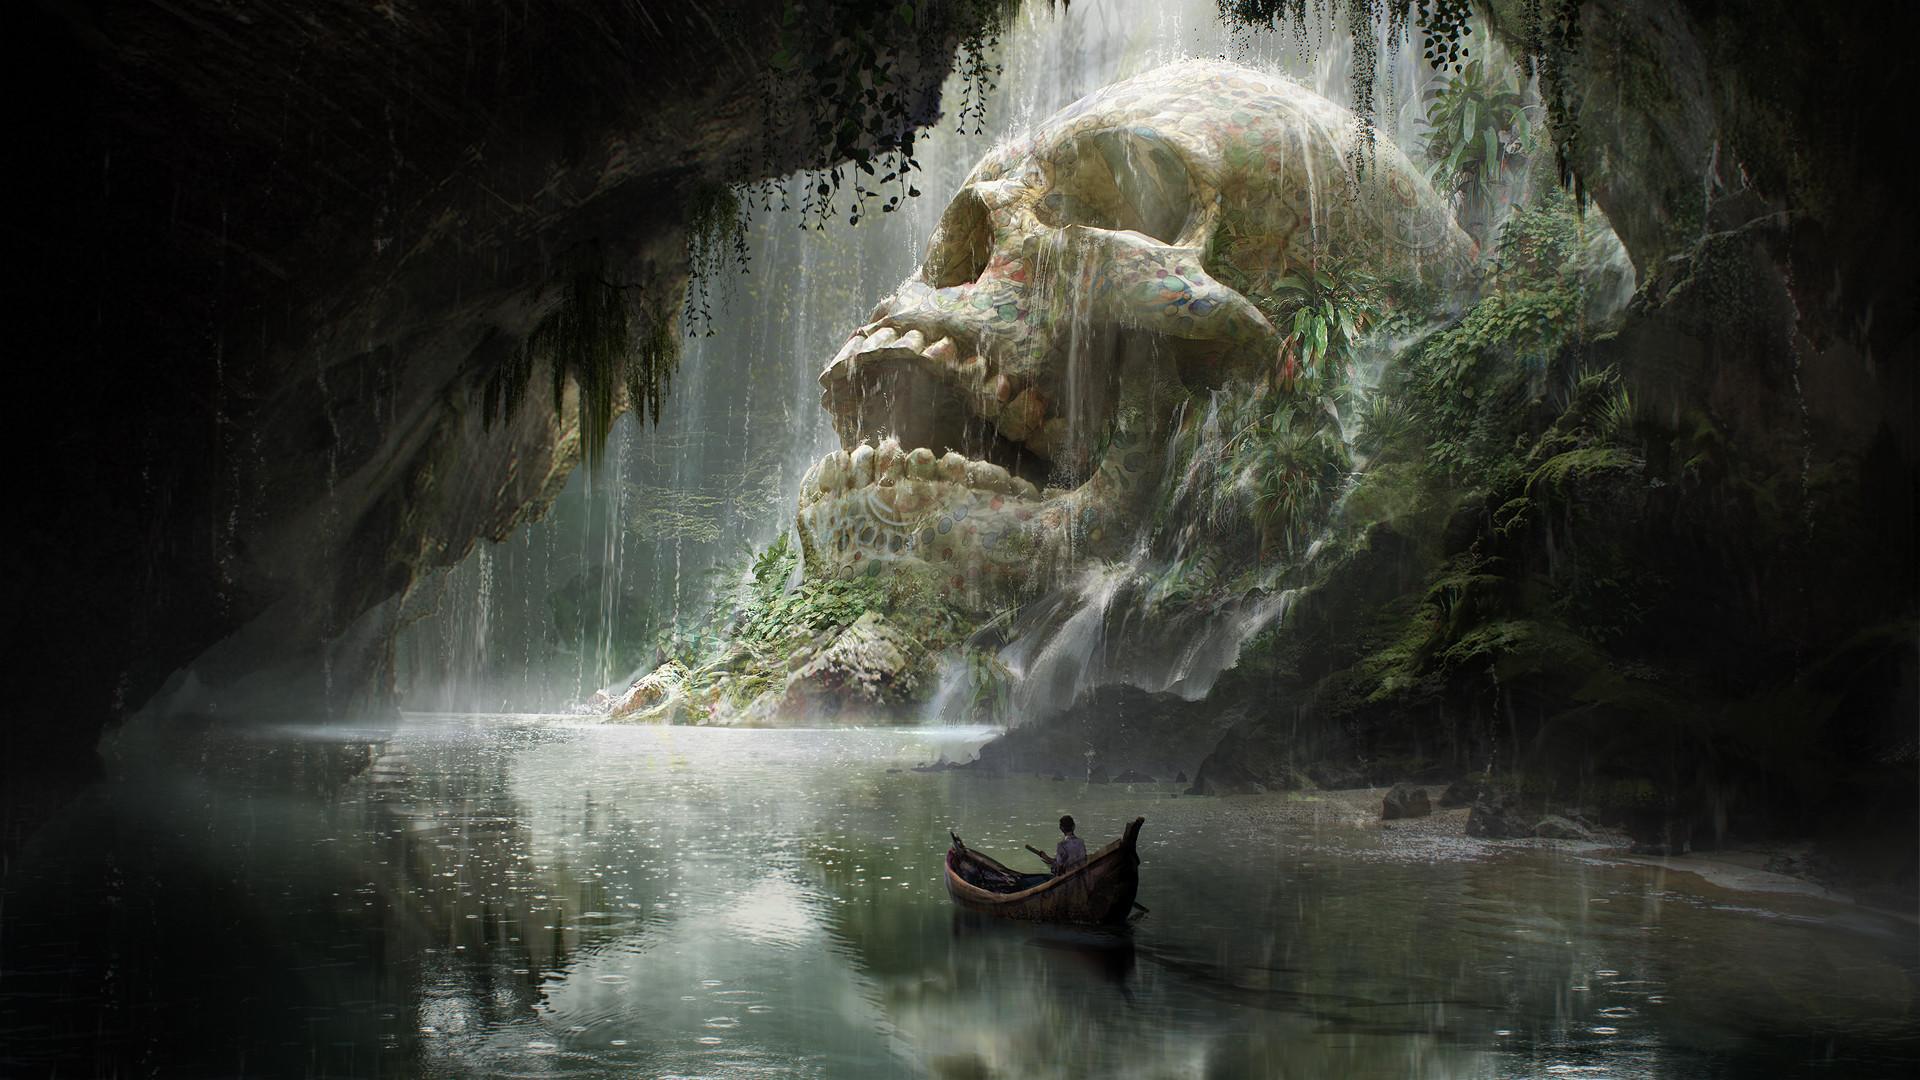 Quentin mabille crane cave v2b